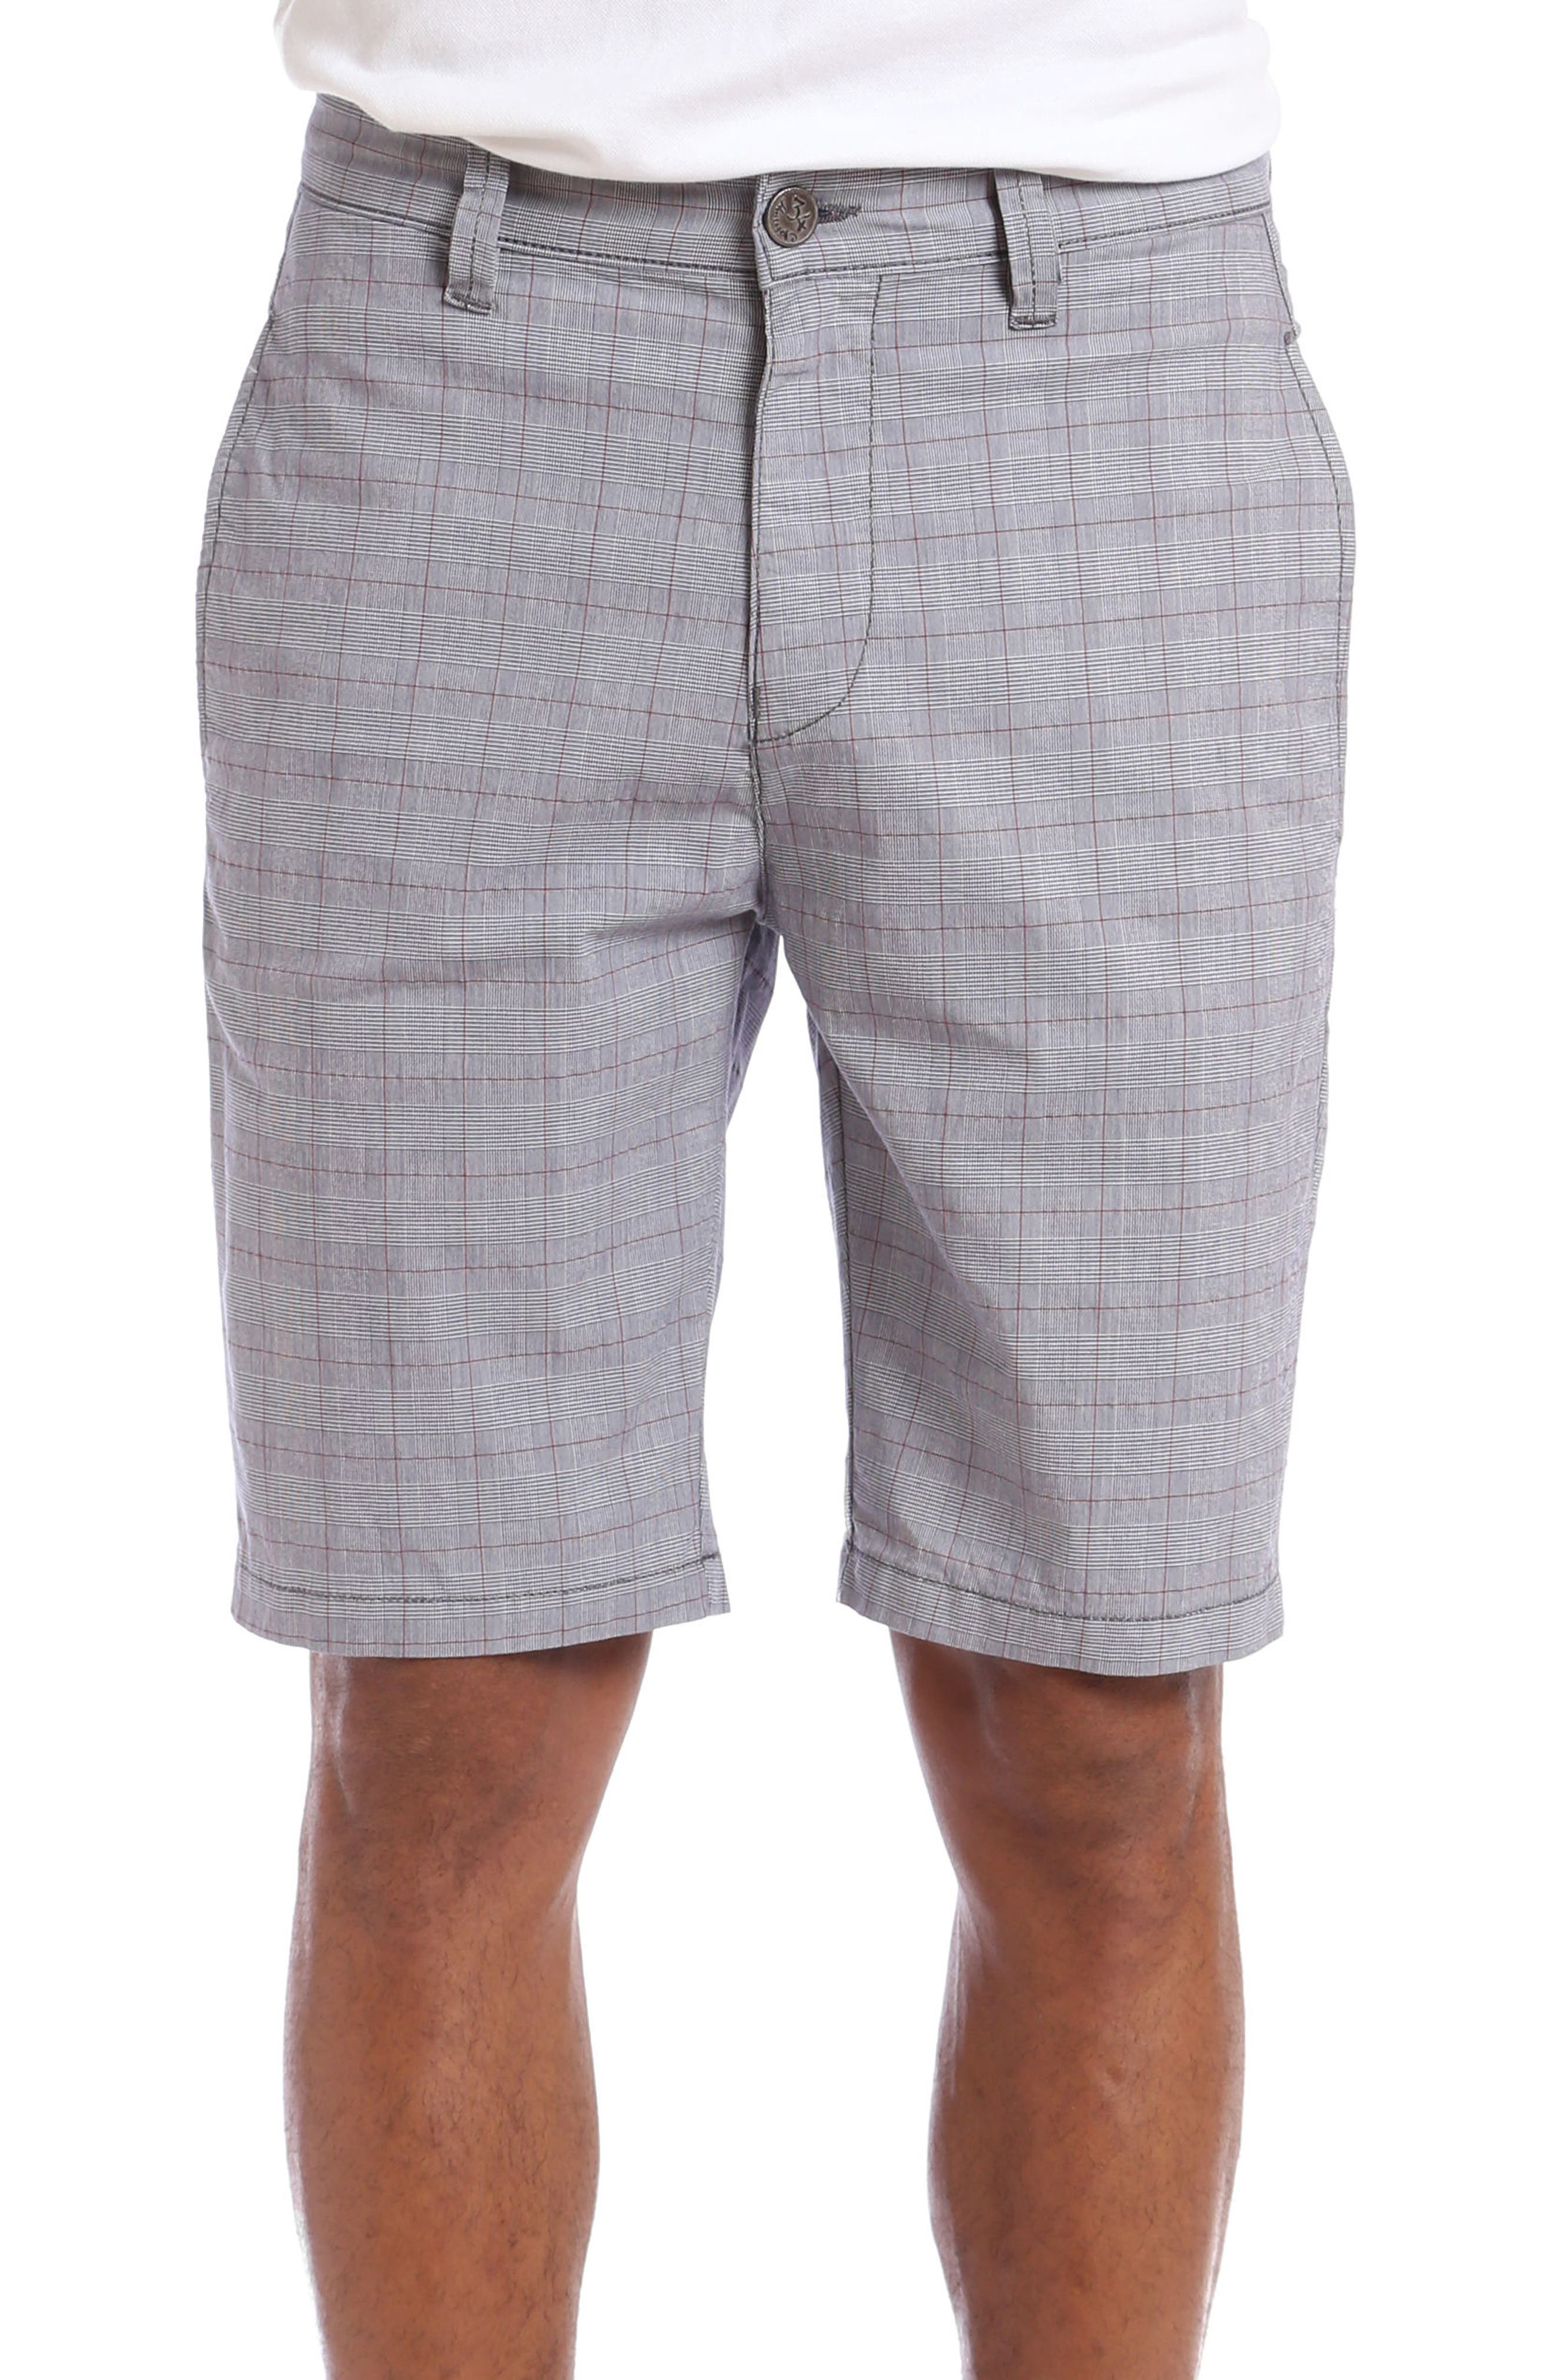 34 HERITAGE Nevada Twill Shorts, Main, color, 020